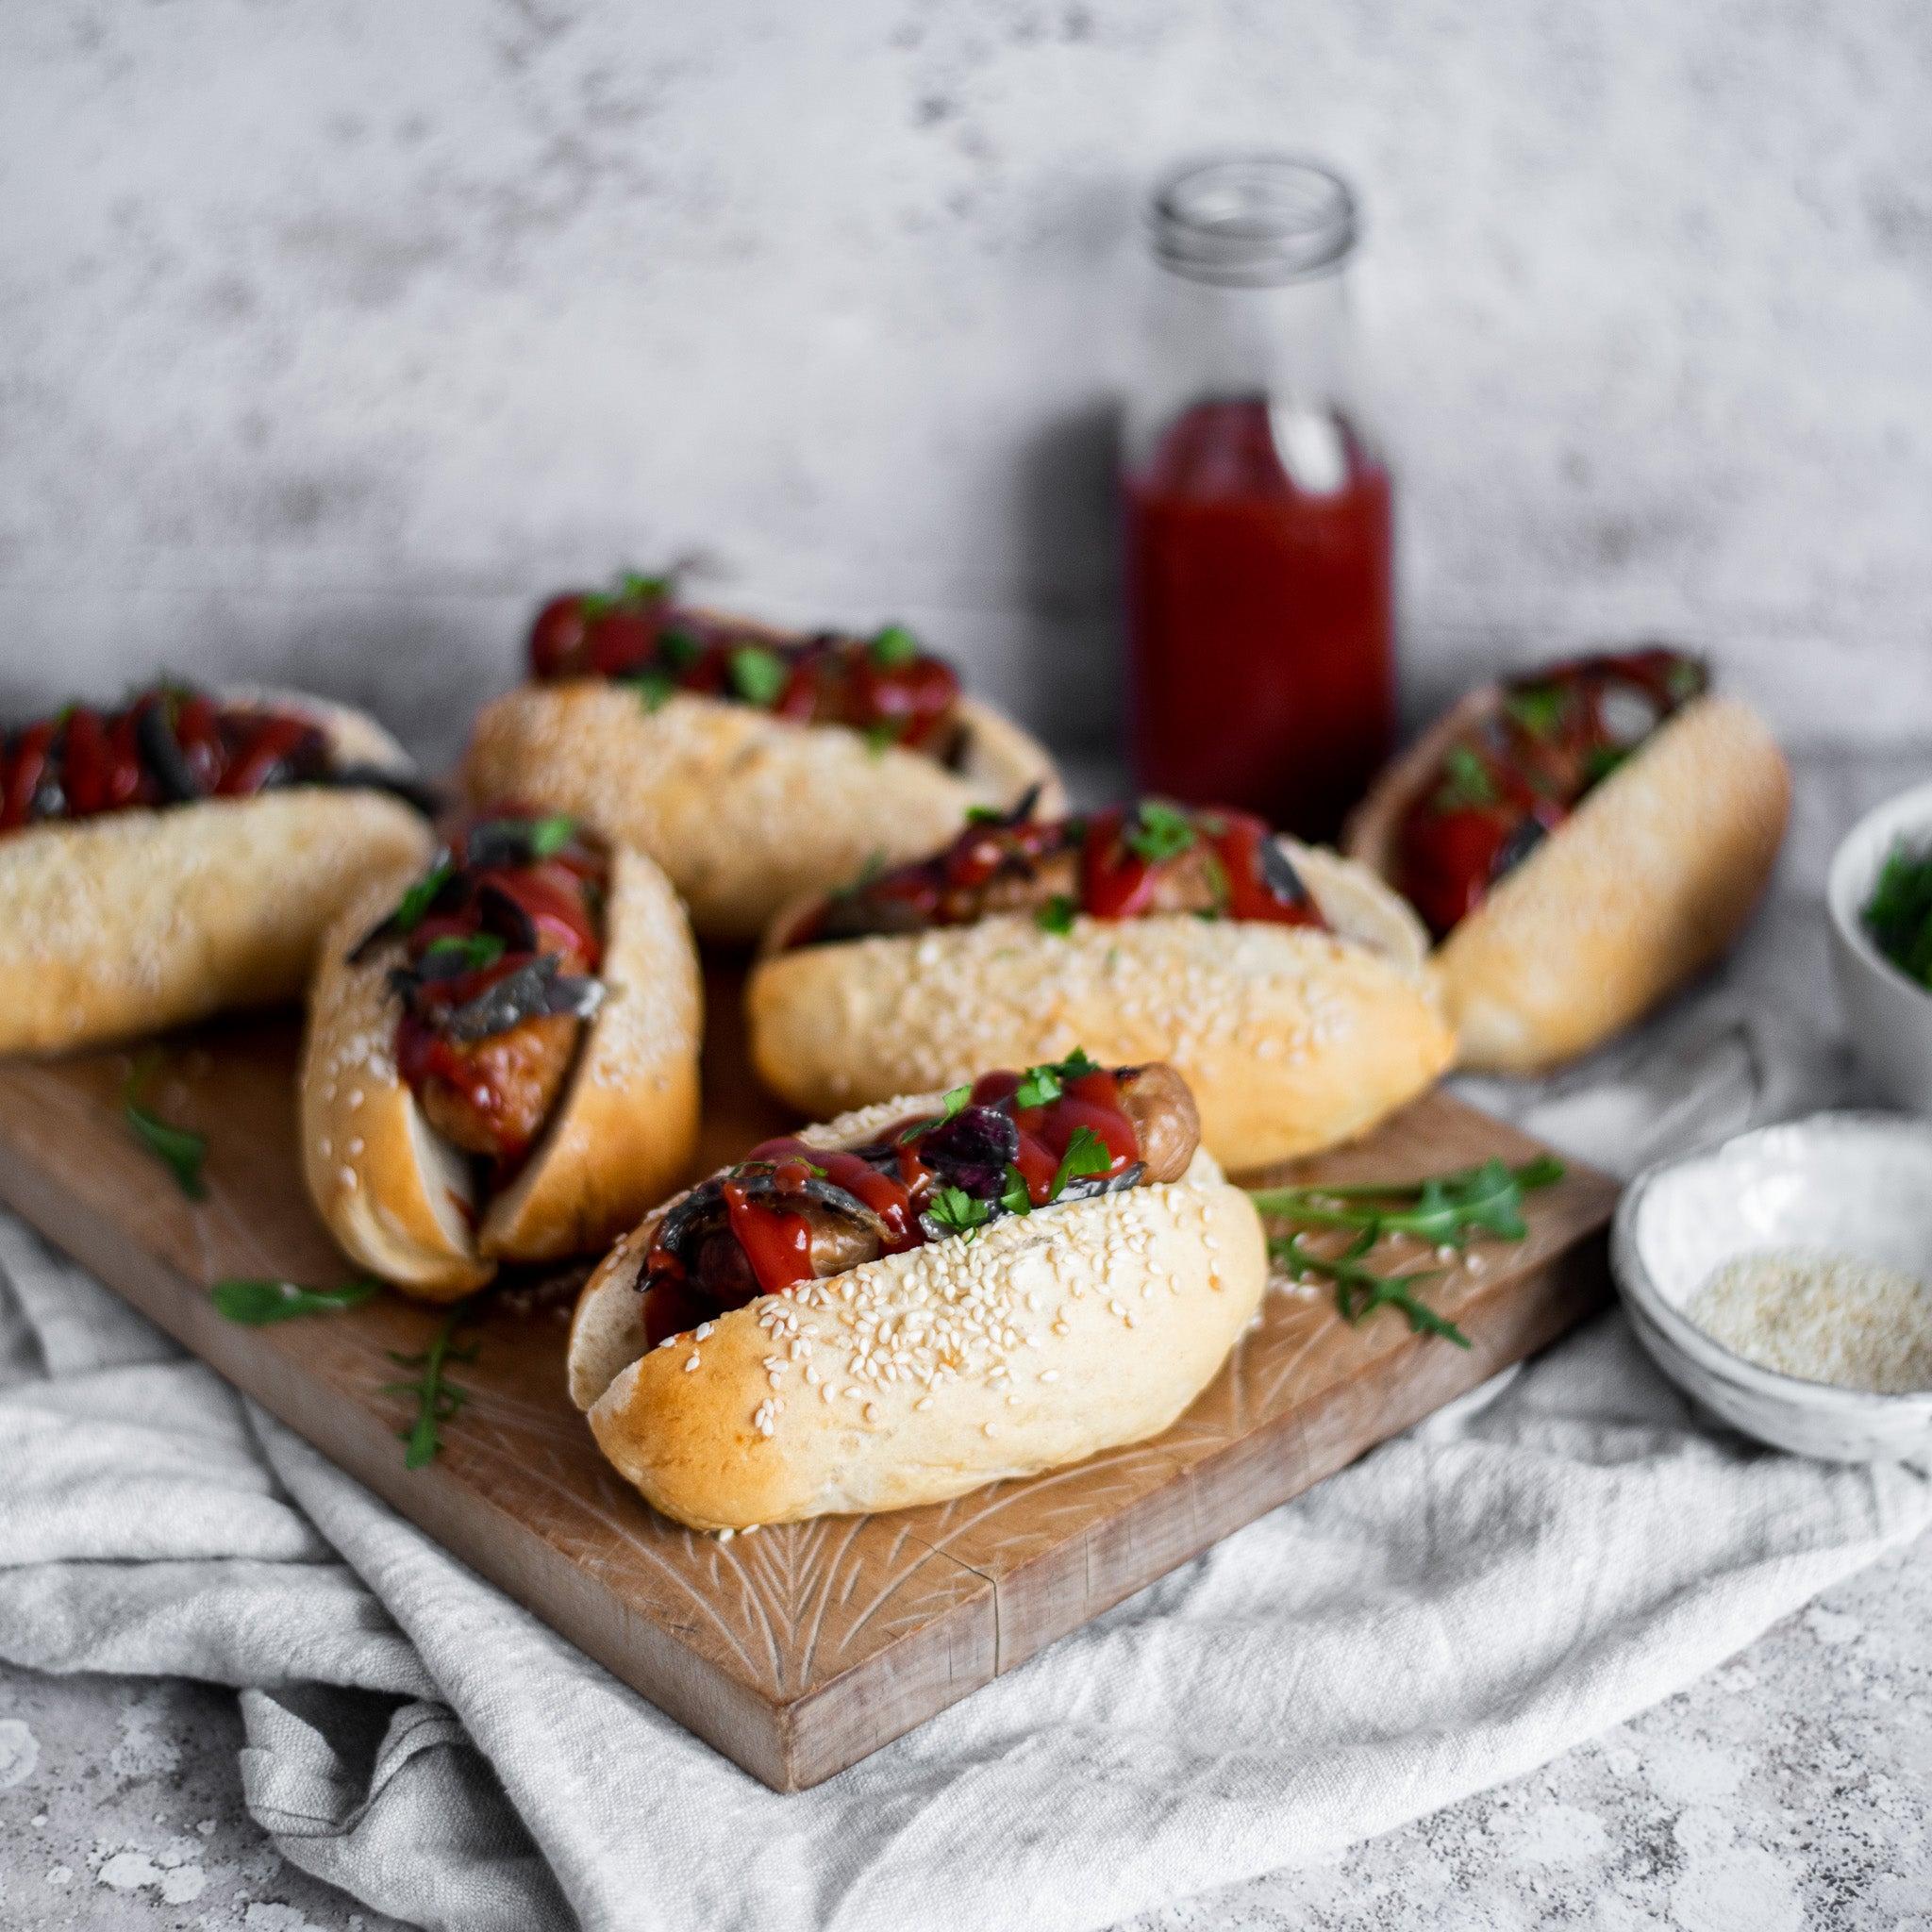 Allinsons-Hot-Dog-Rolls-1-1-Baking-Mad-8.jpg